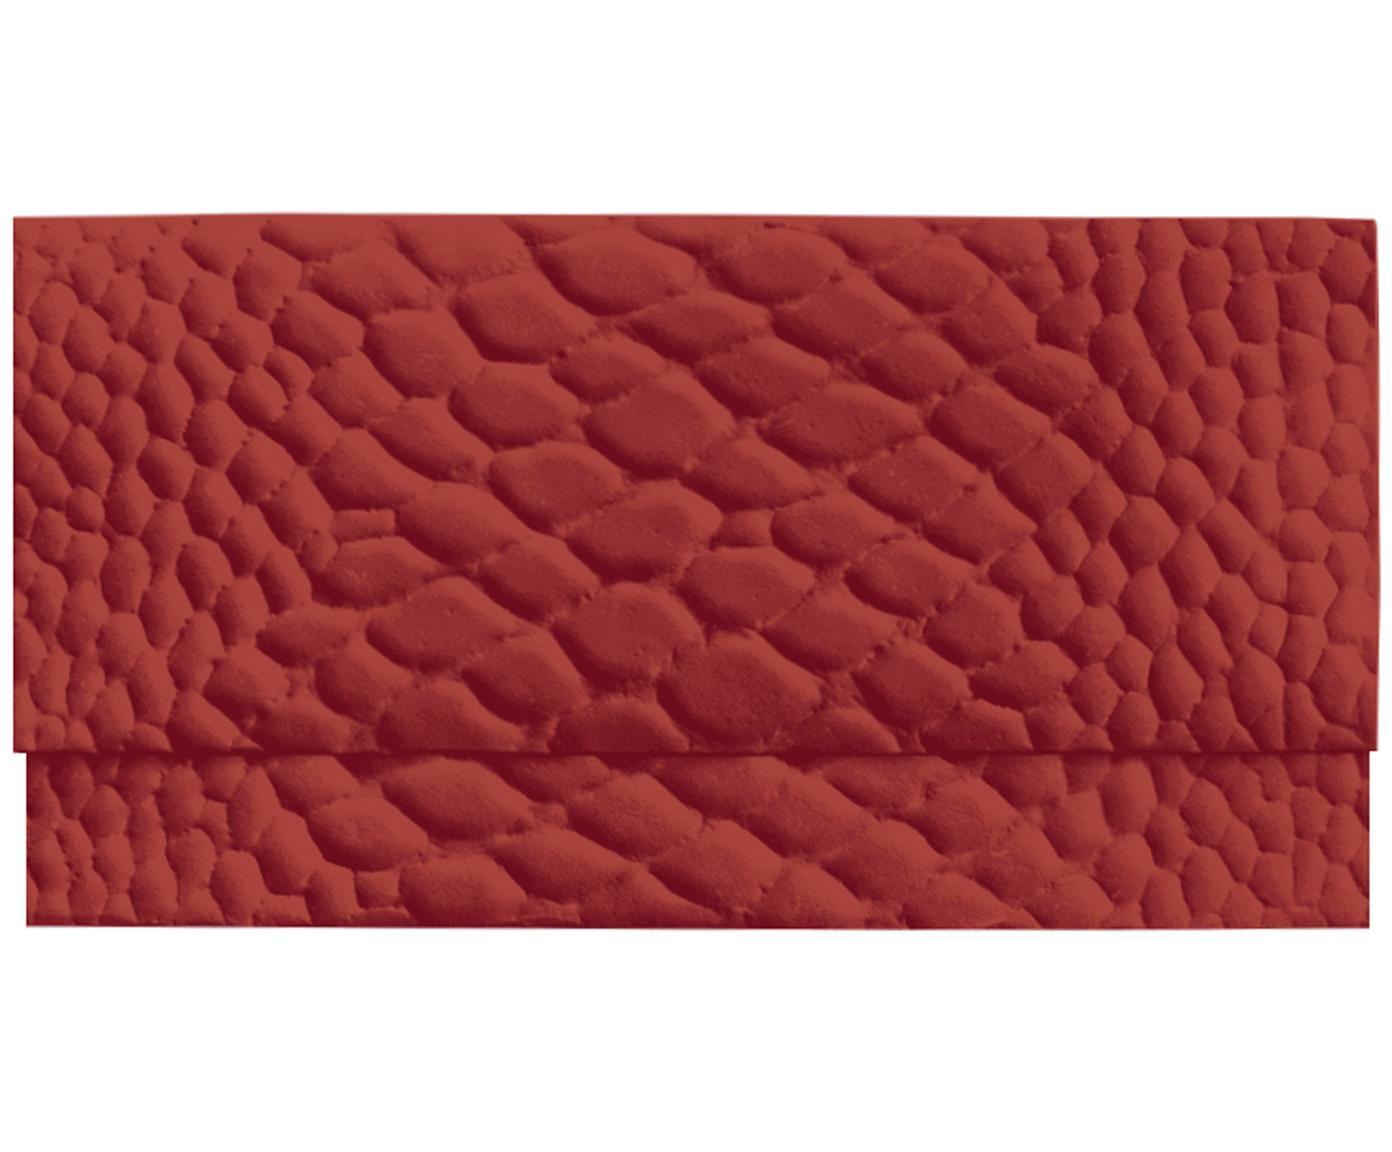 Umschlag Snake, Papier, Rot, 23 x 12 cm